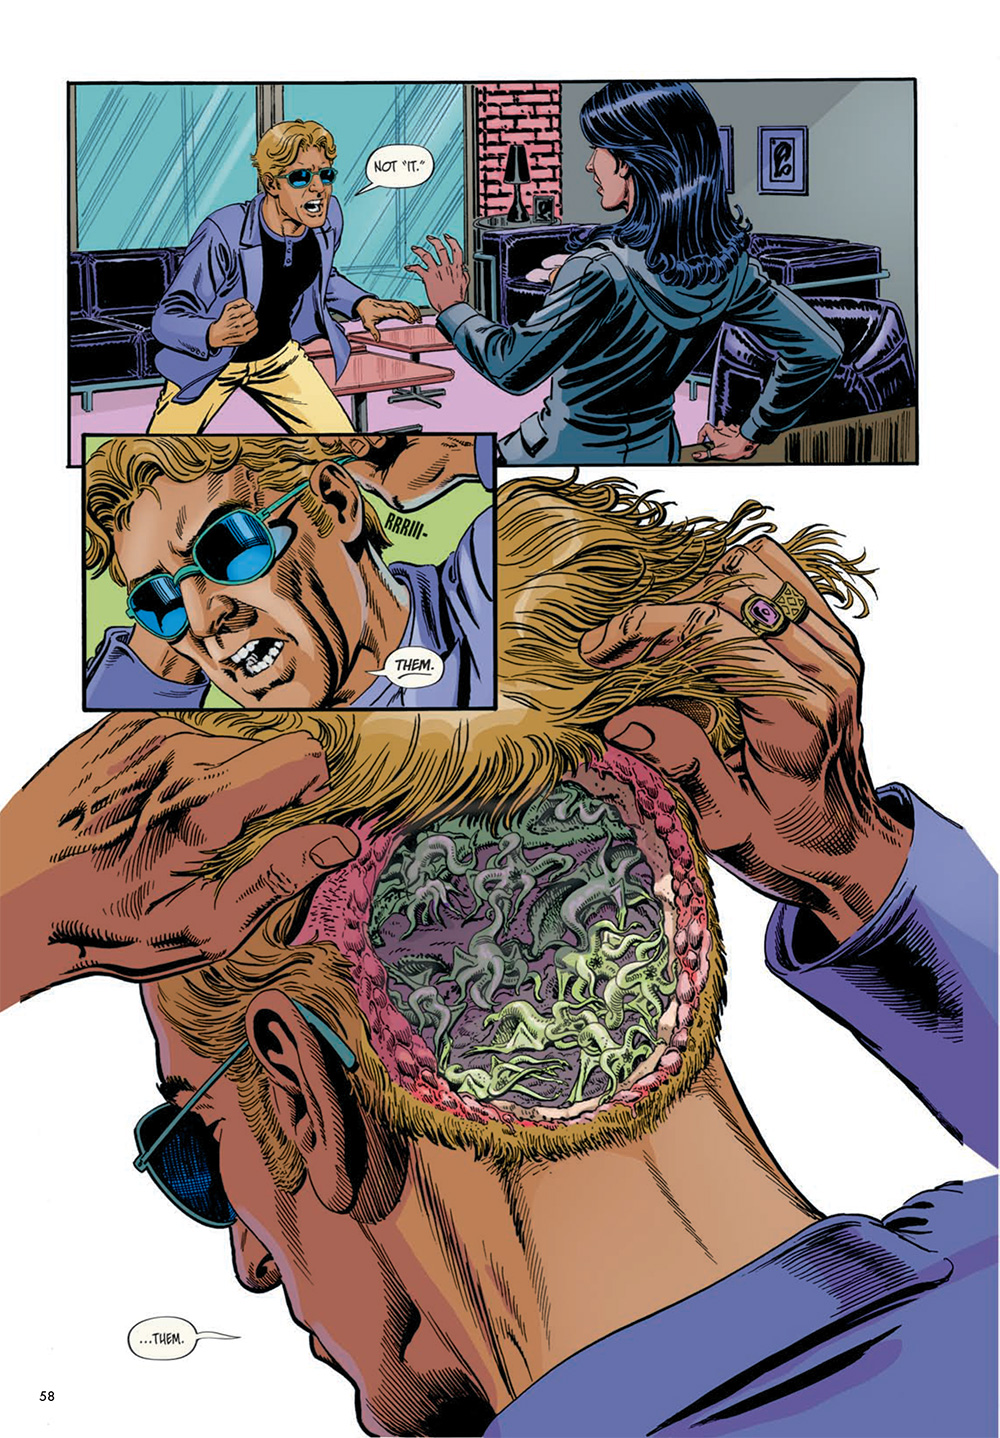 Lovecraftian lice.